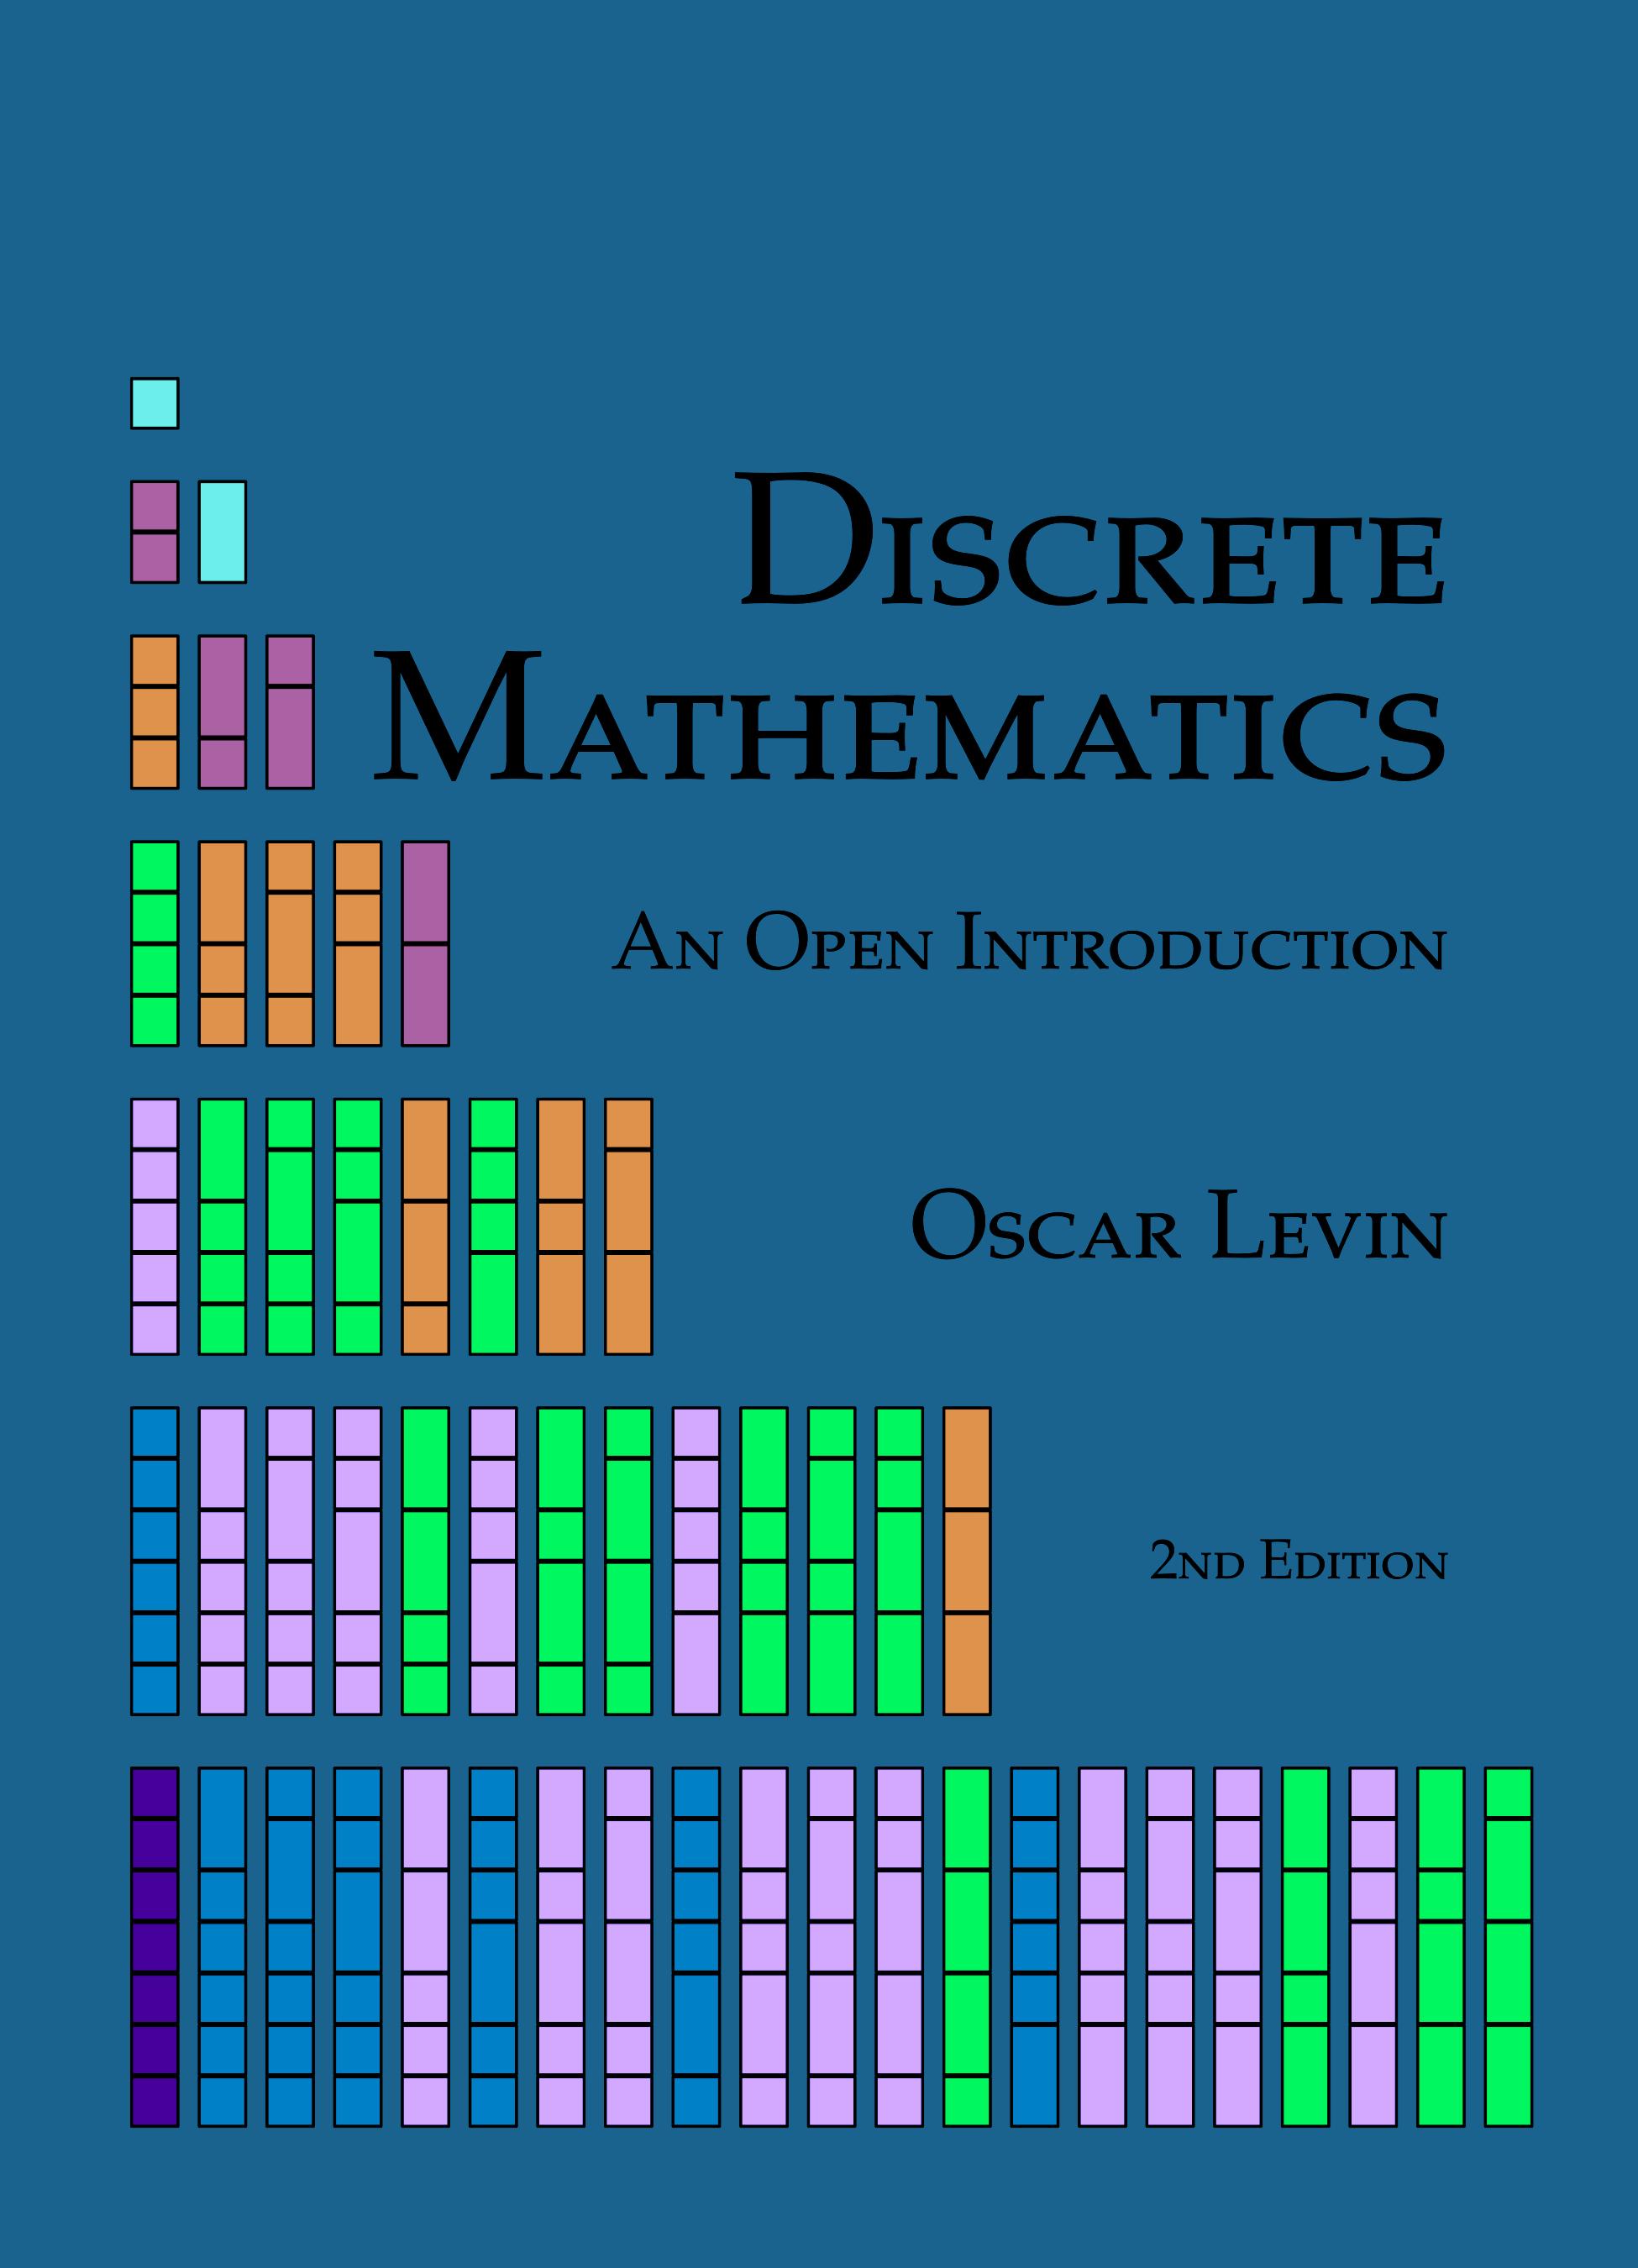 Discrete Math Tutorial